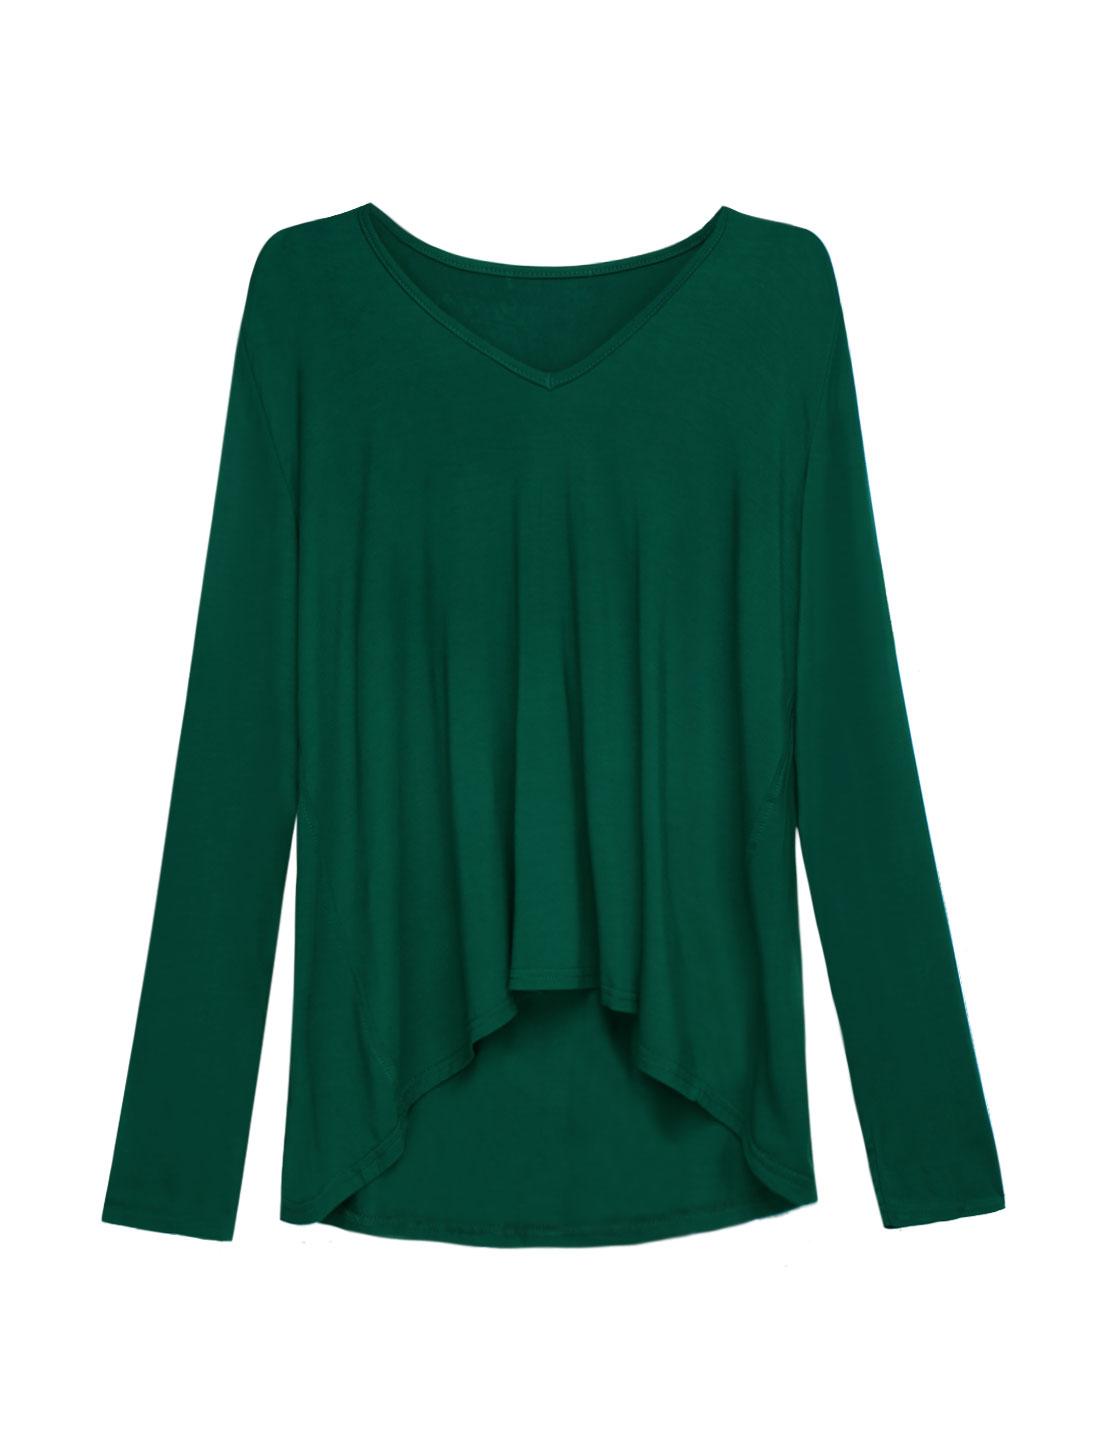 Women-V-Neck-Long-Sleeves-High-Low-Hem-Loose-Tunic-T-shirt